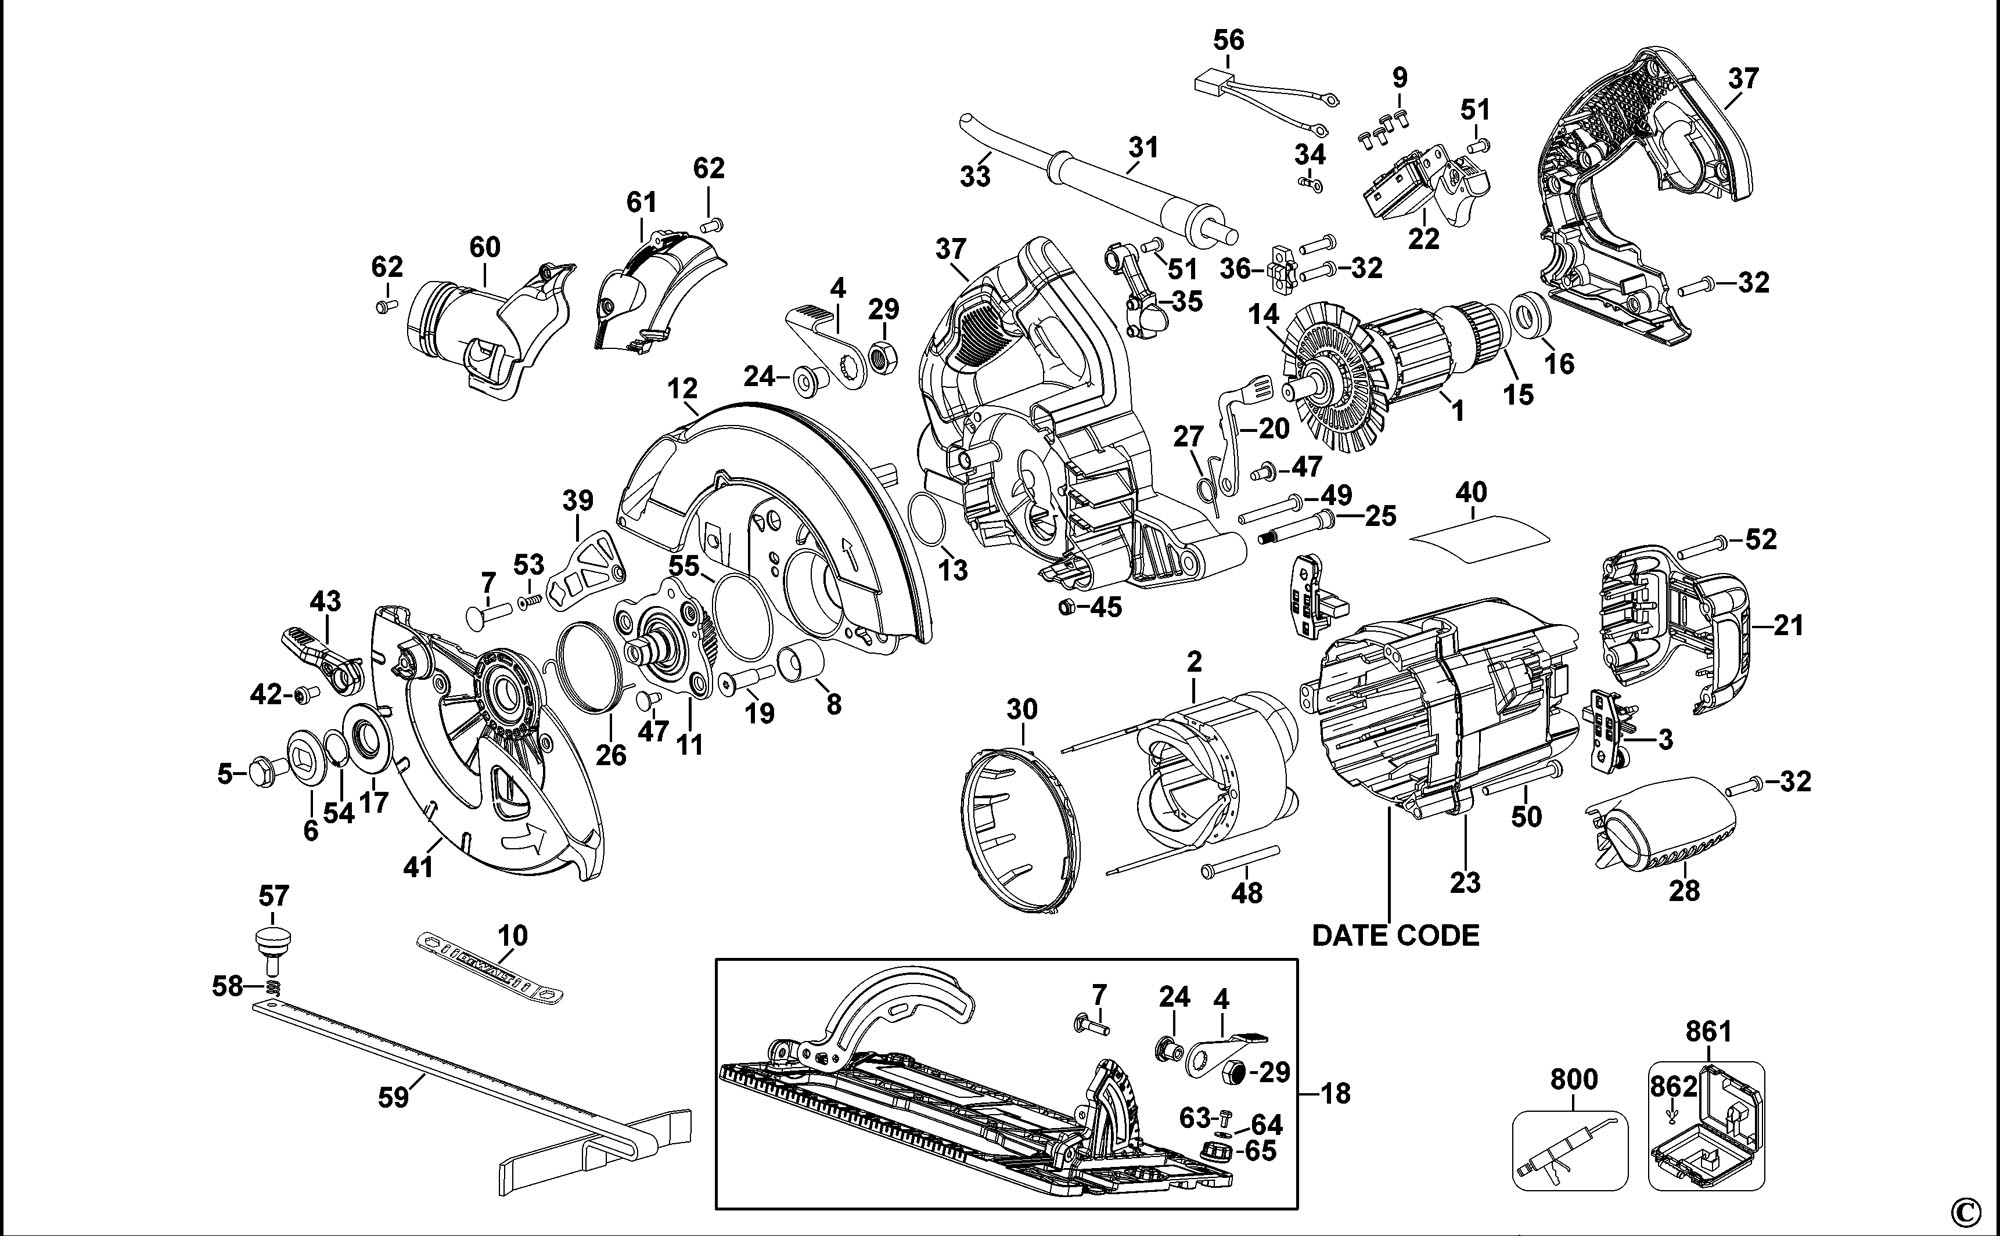 Spares For Dewalt Dwe576 Circular Saw Type 1 Spare Dwe576 Type 1 From Power Tool Centre